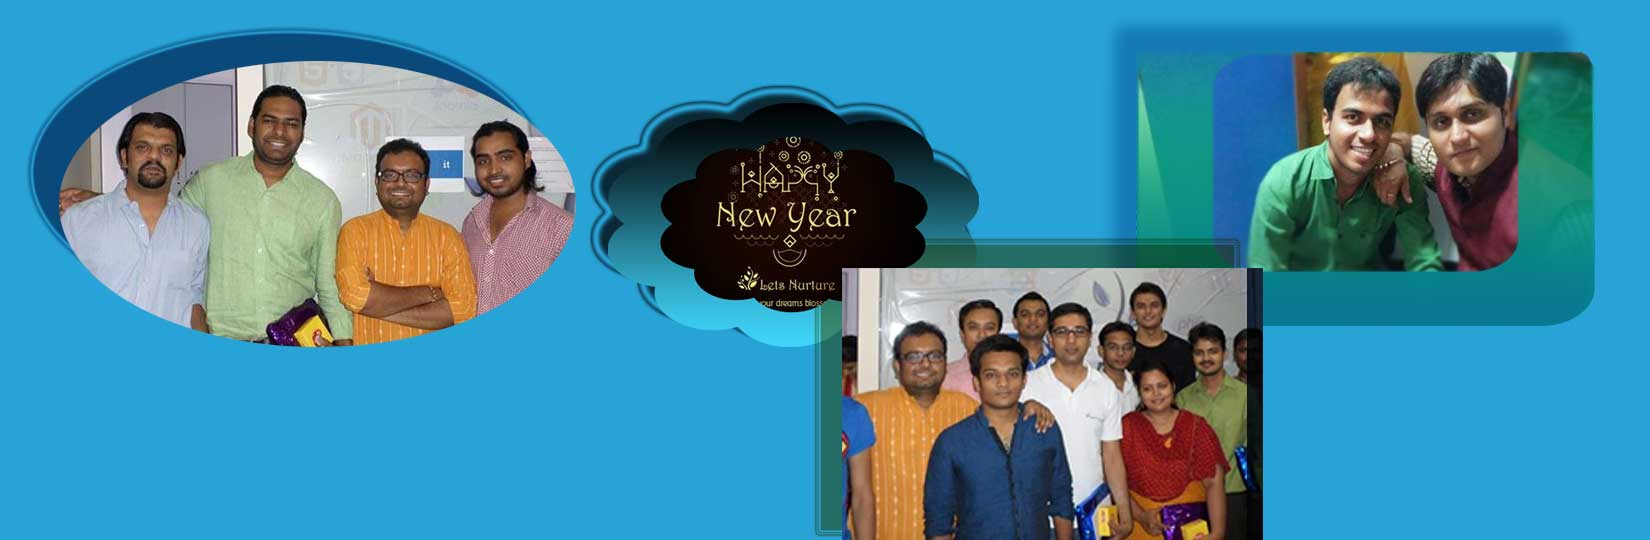 Diwali Celebrations at LetsNurture